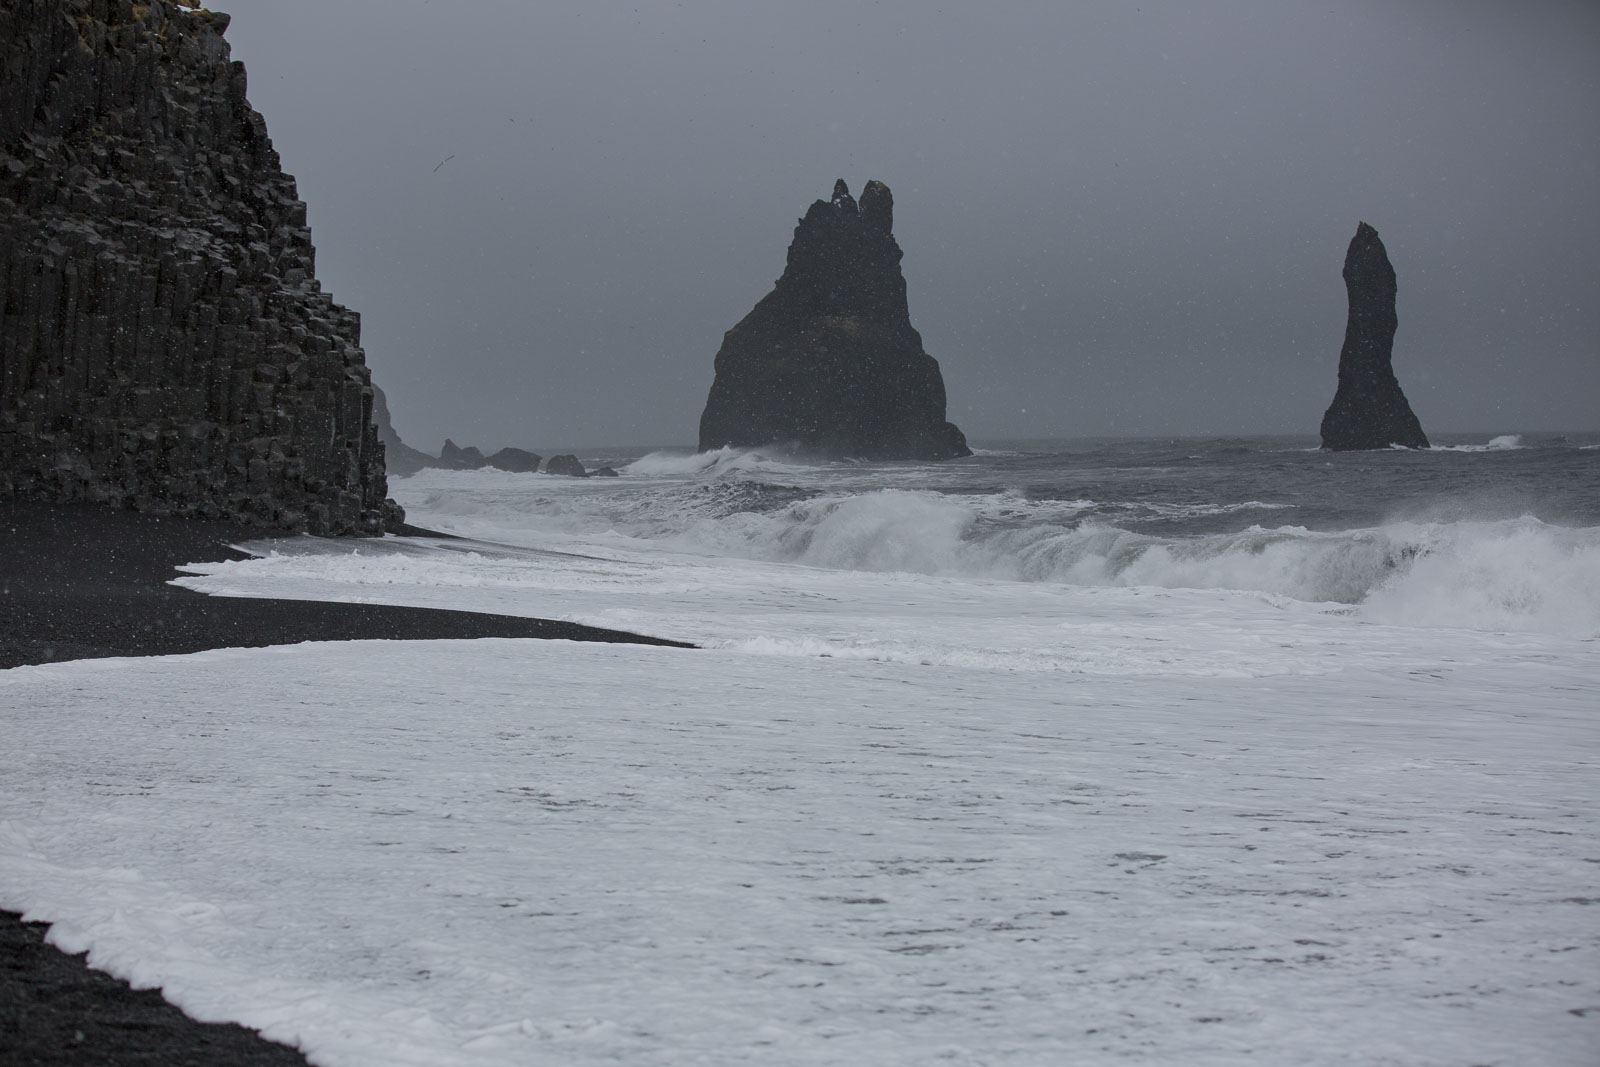 Reynisfjara, the black sand beach